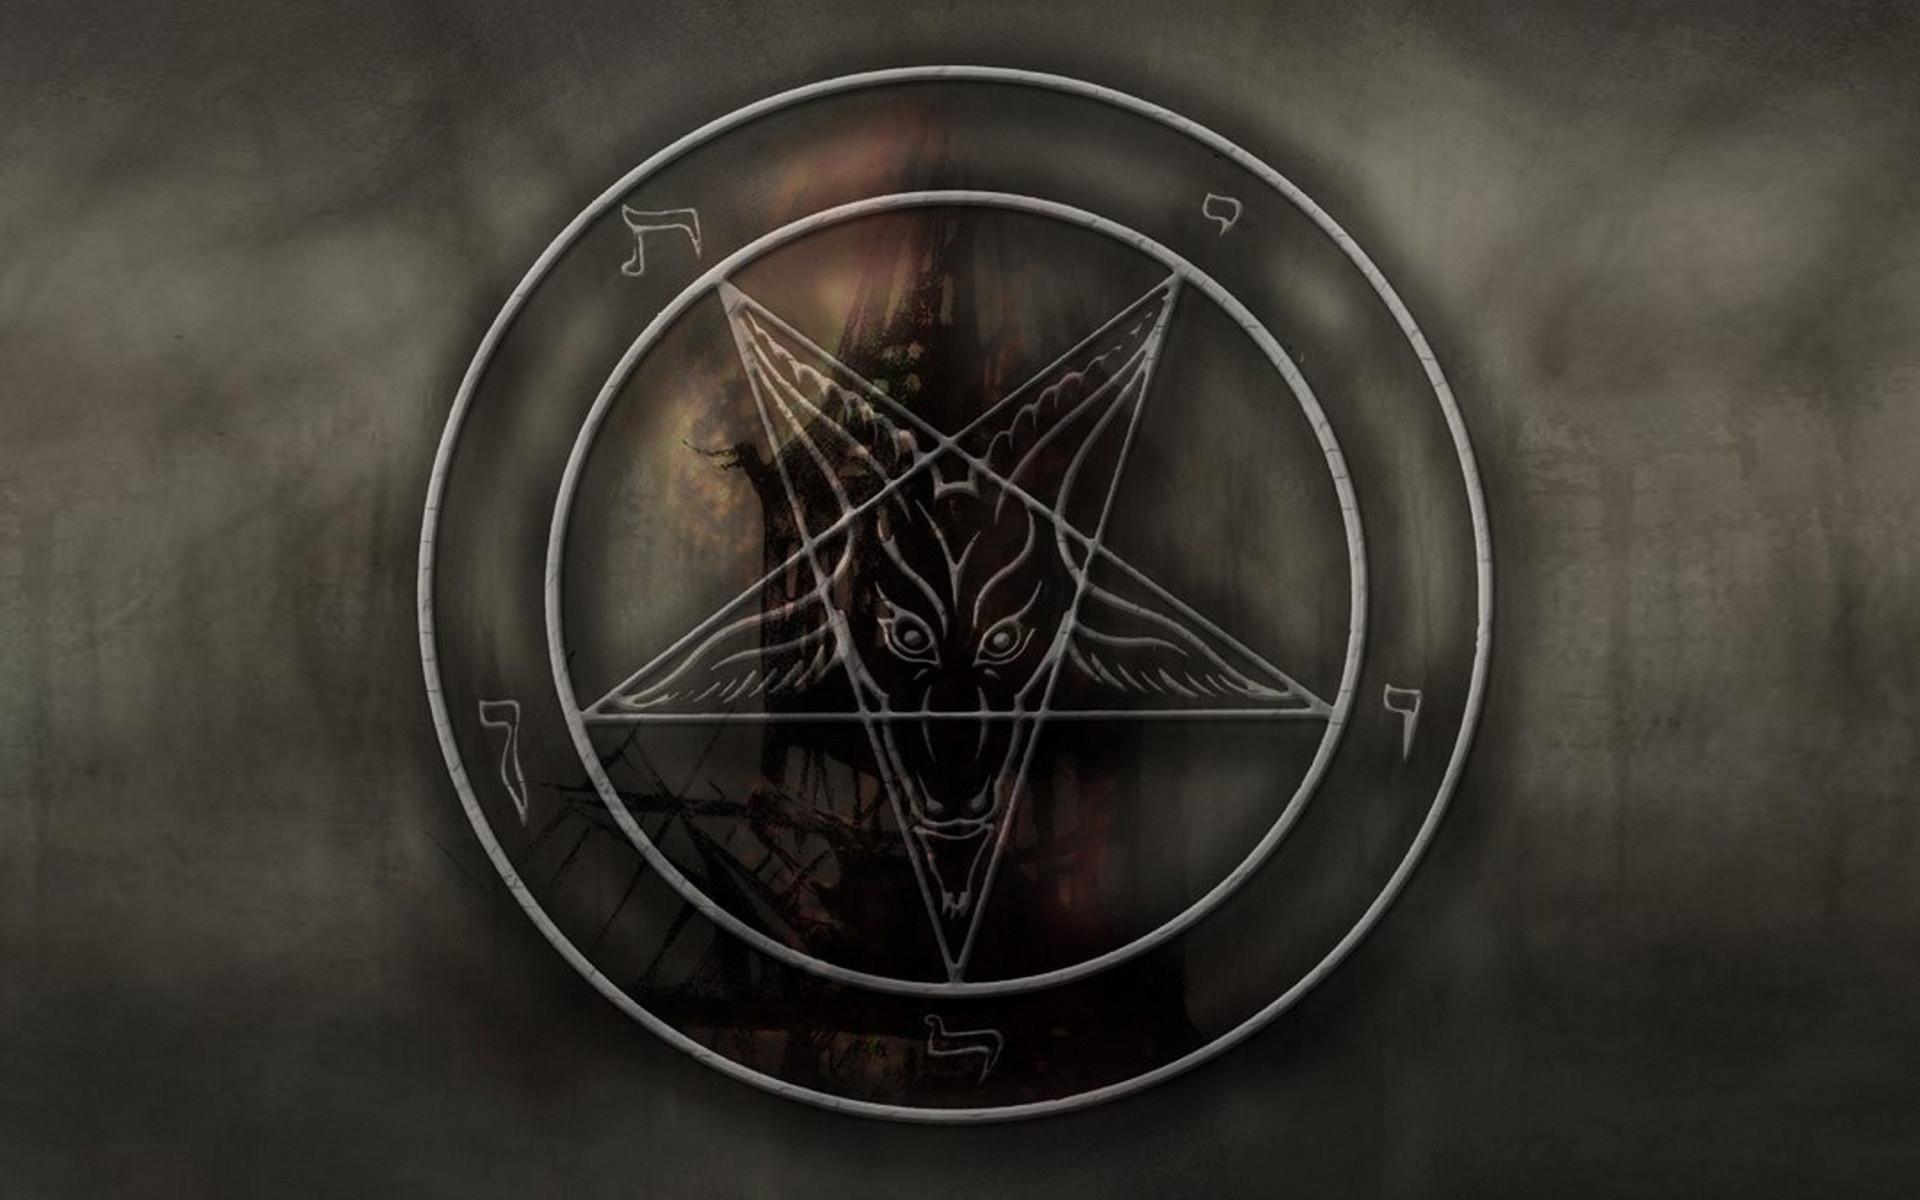 Wiccan Pentacle Wallpa...